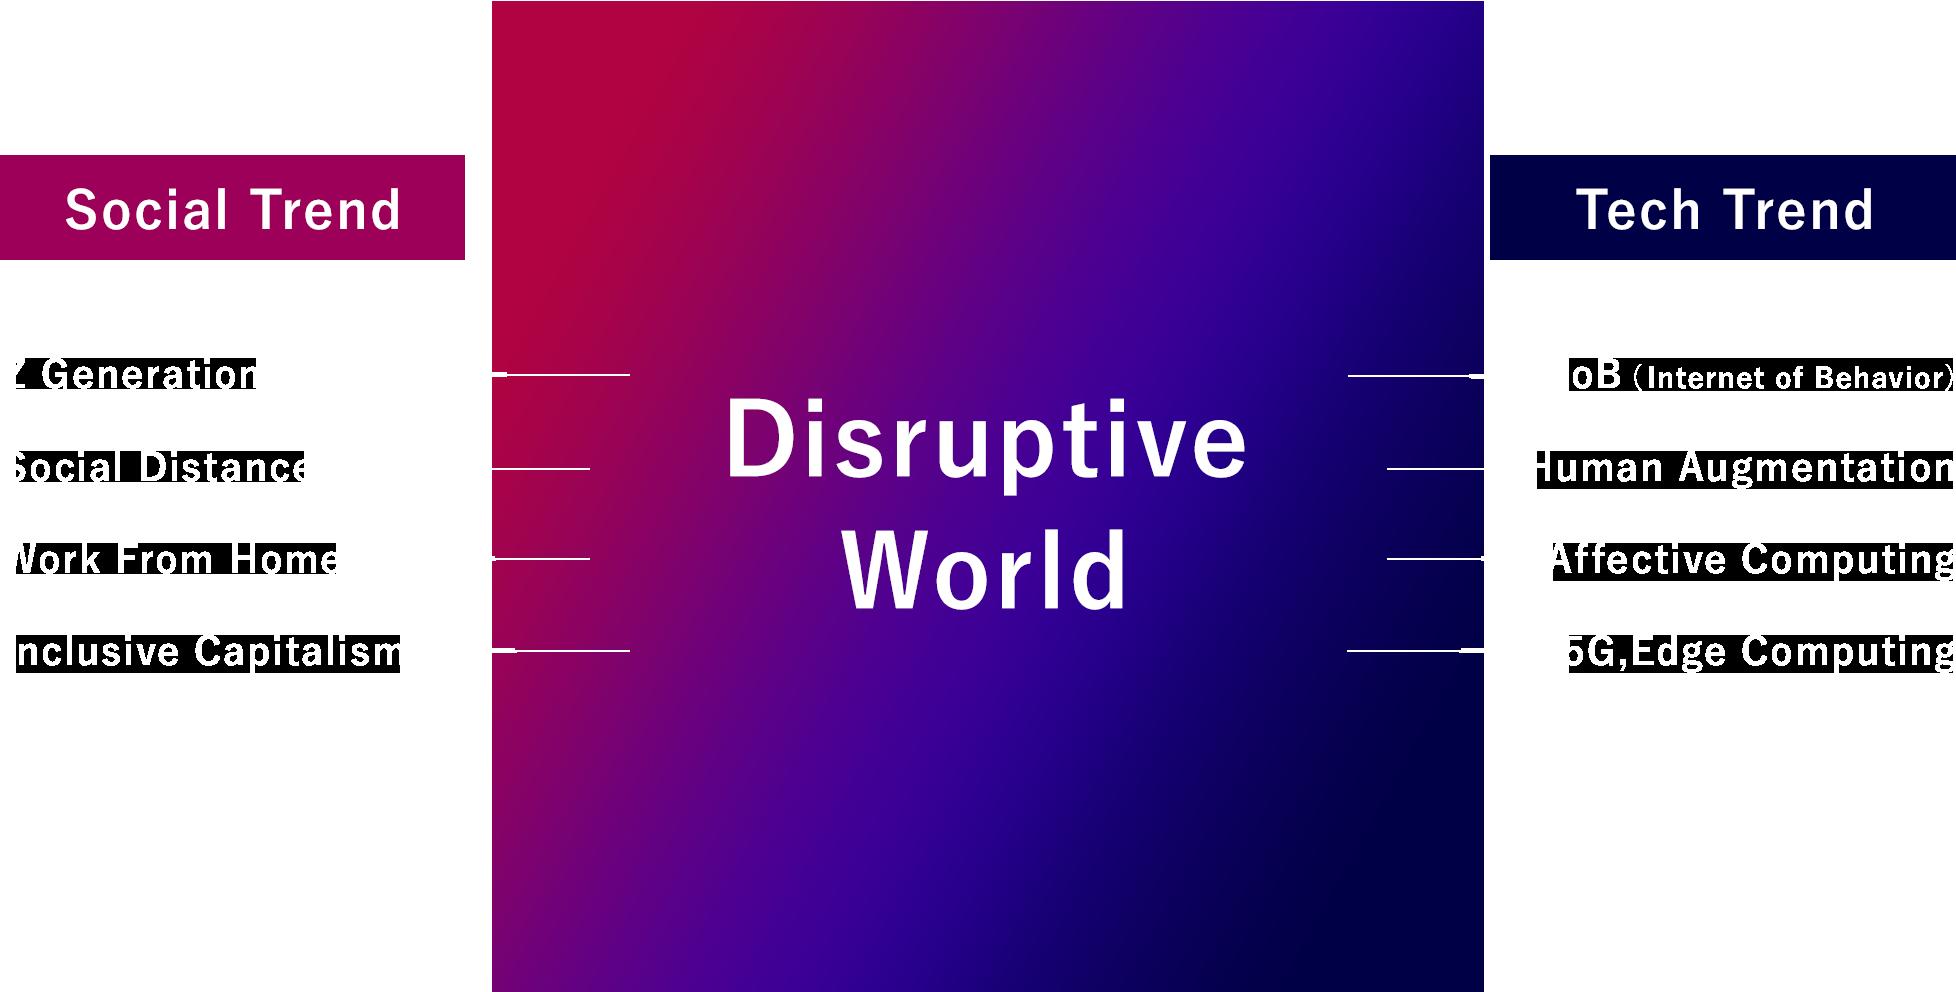 Social Trend/Disruptive World